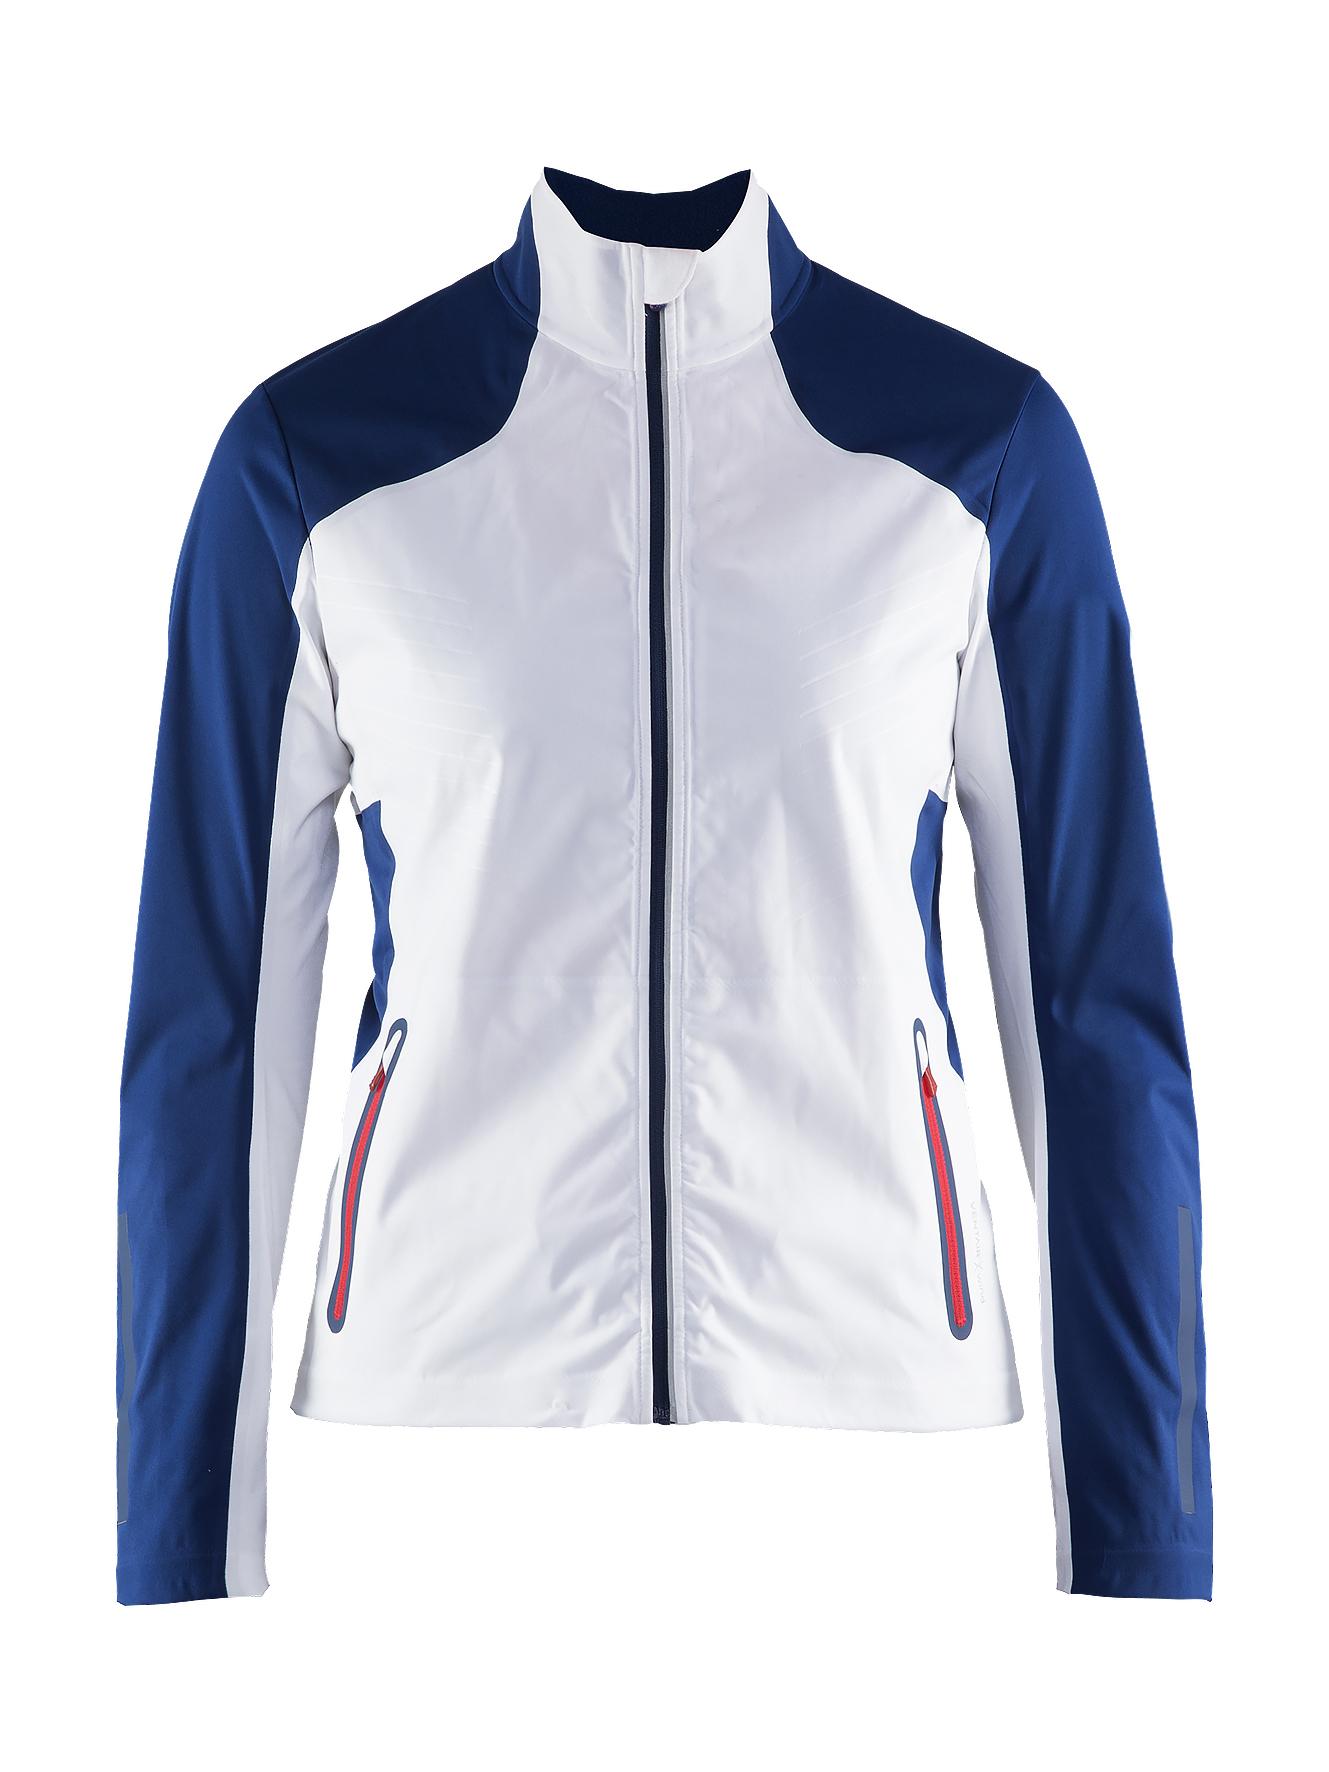 0dce6b4362c dame jacket craft - Prissøk - Gir deg laveste pris